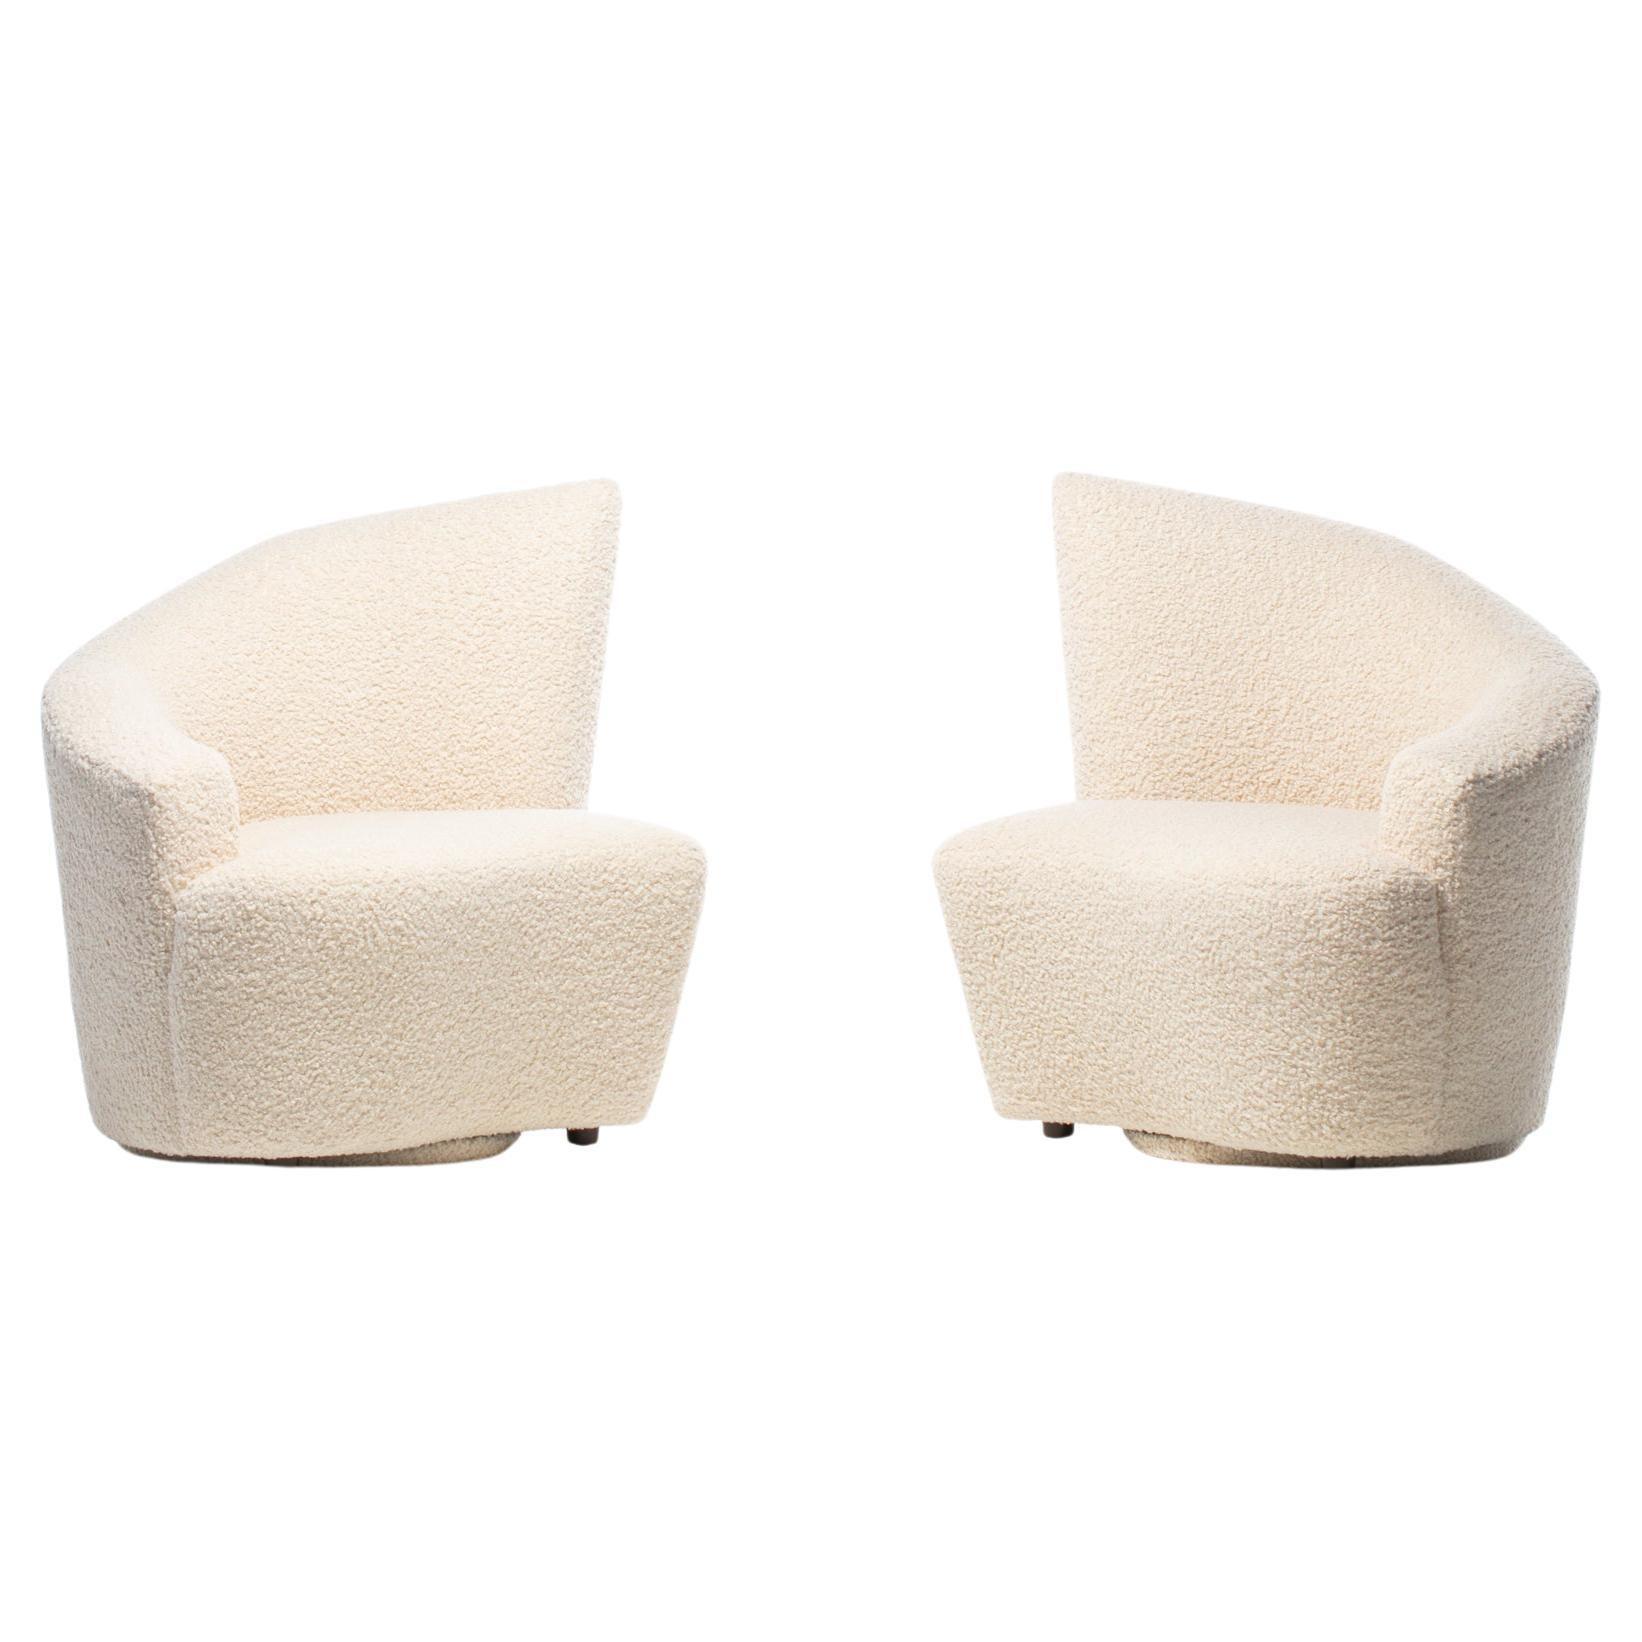 Vladimir Kagan Bilbao Swivel Slipper Chairs in Ivory Bouclé